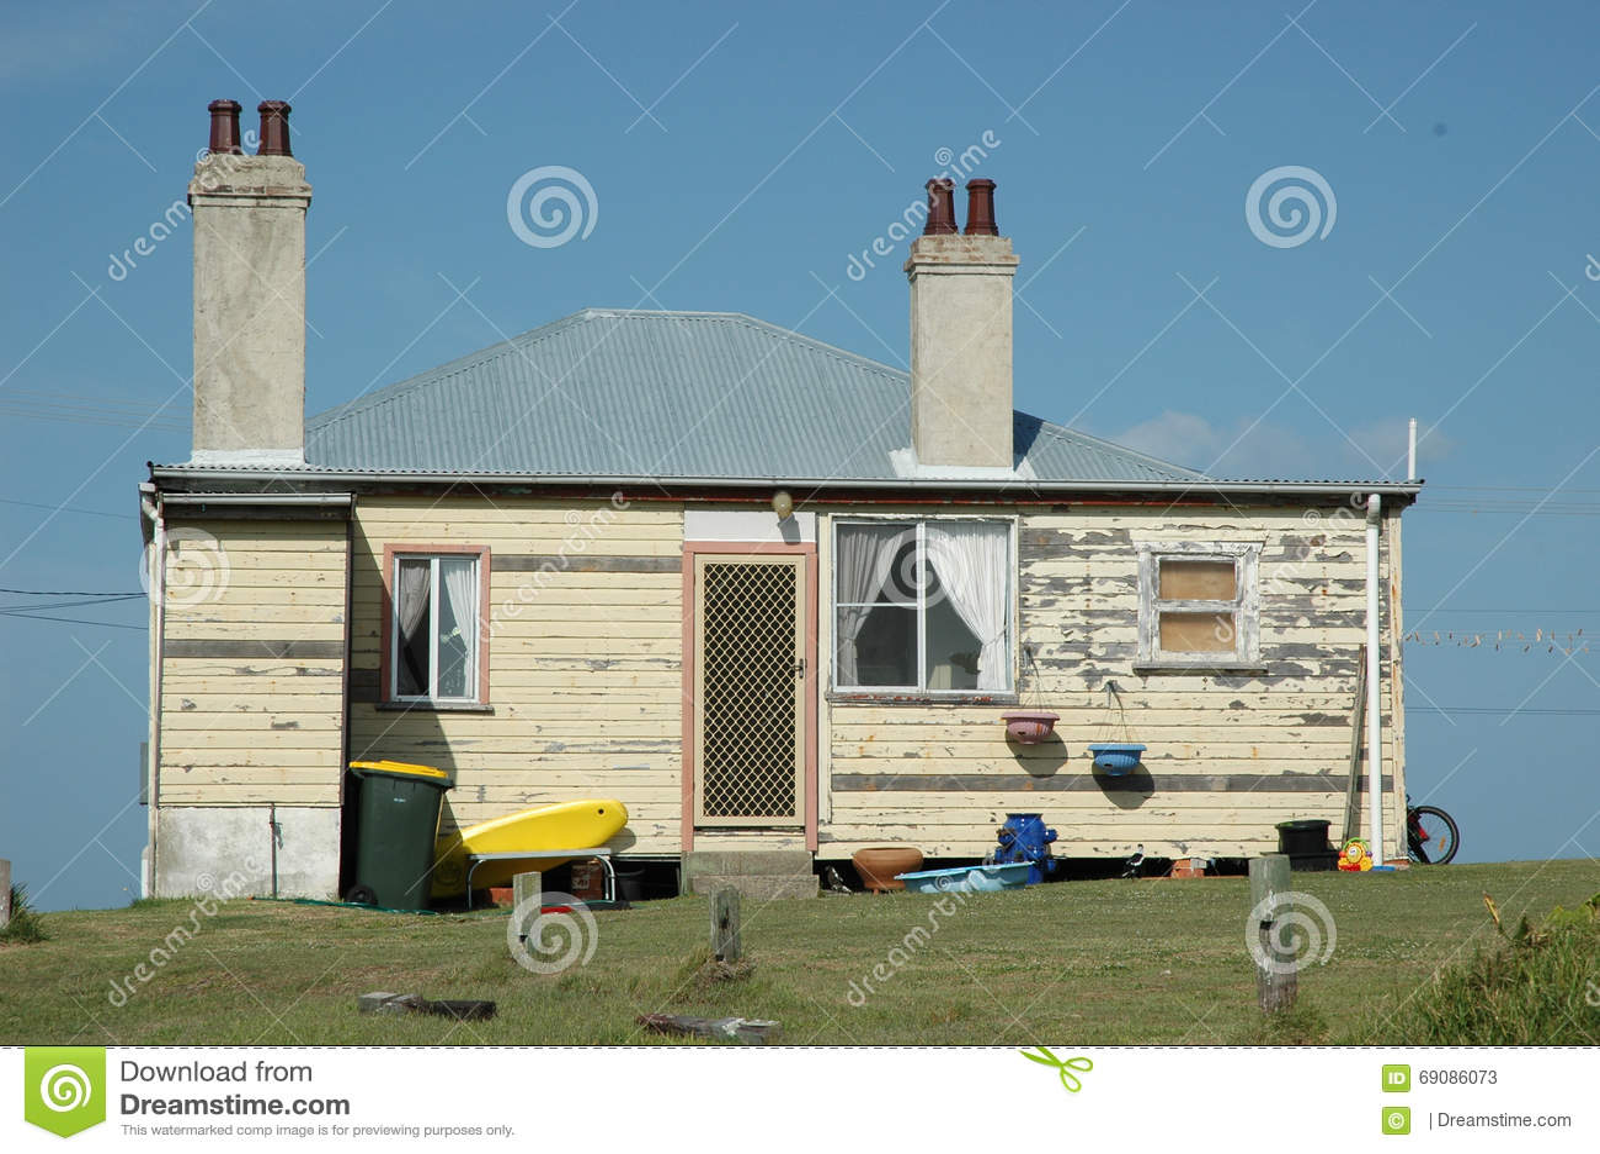 An old weather board house in Yamba, Australia